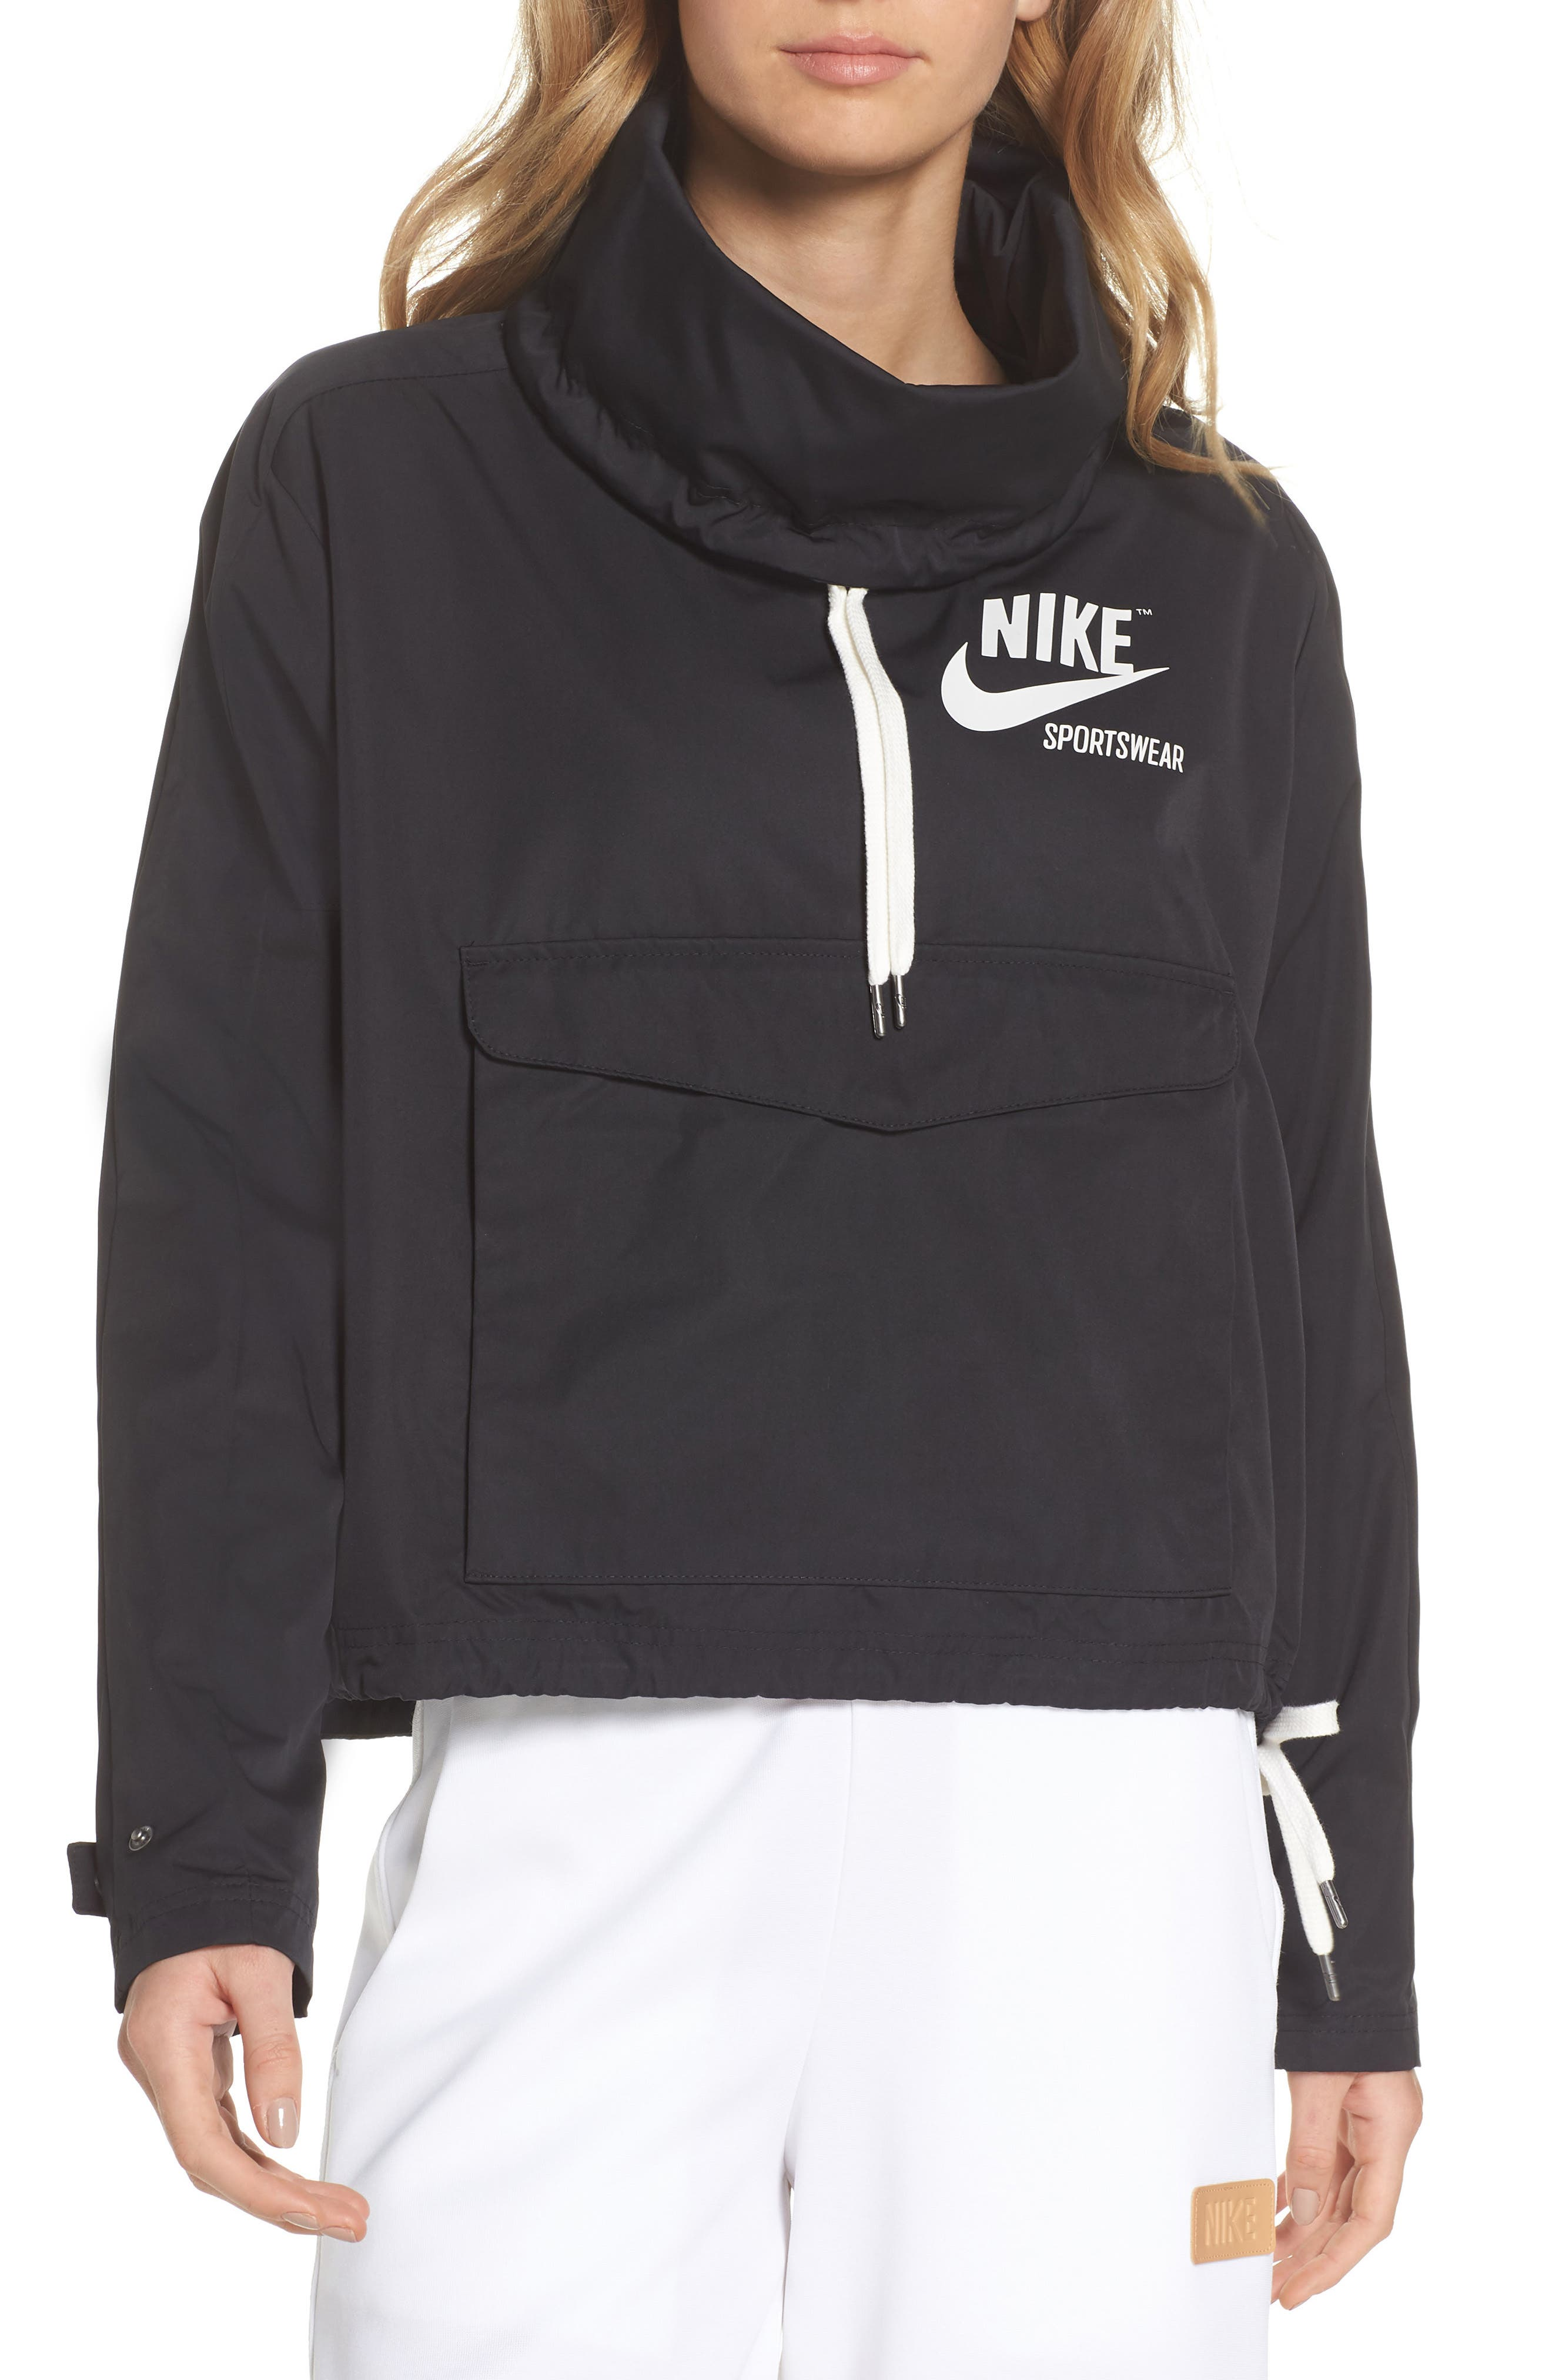 Sportswear Archive Jacket,                             Main thumbnail 1, color,                             Black/ Black